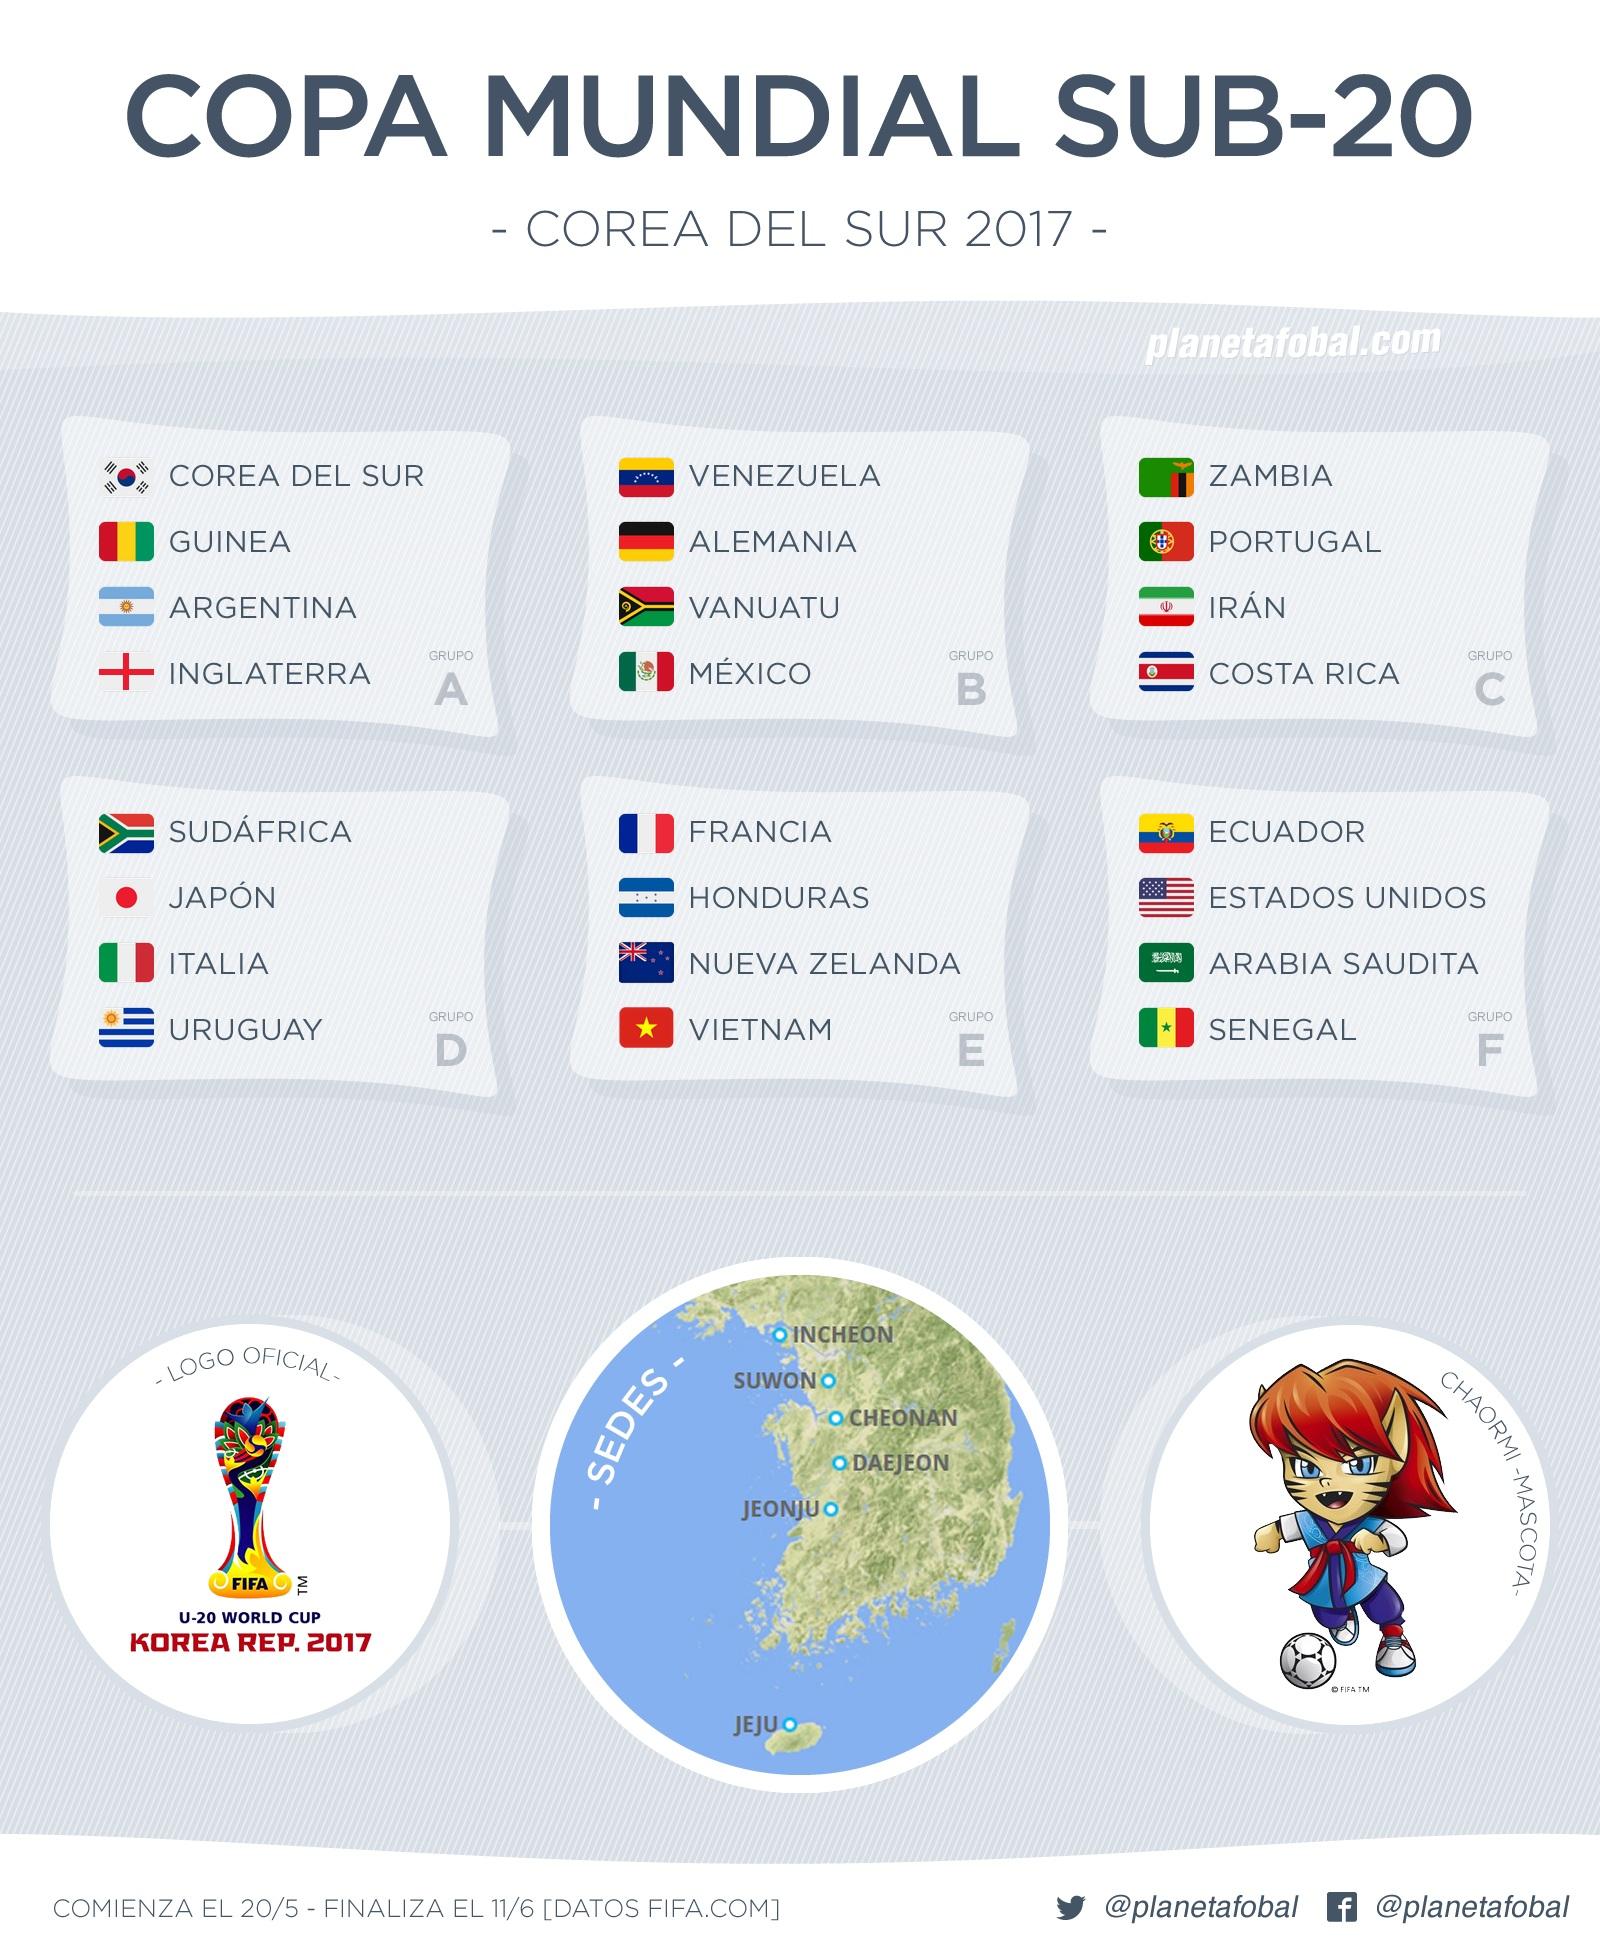 Copa Mundial Sub-20 Corea del Sur 2017